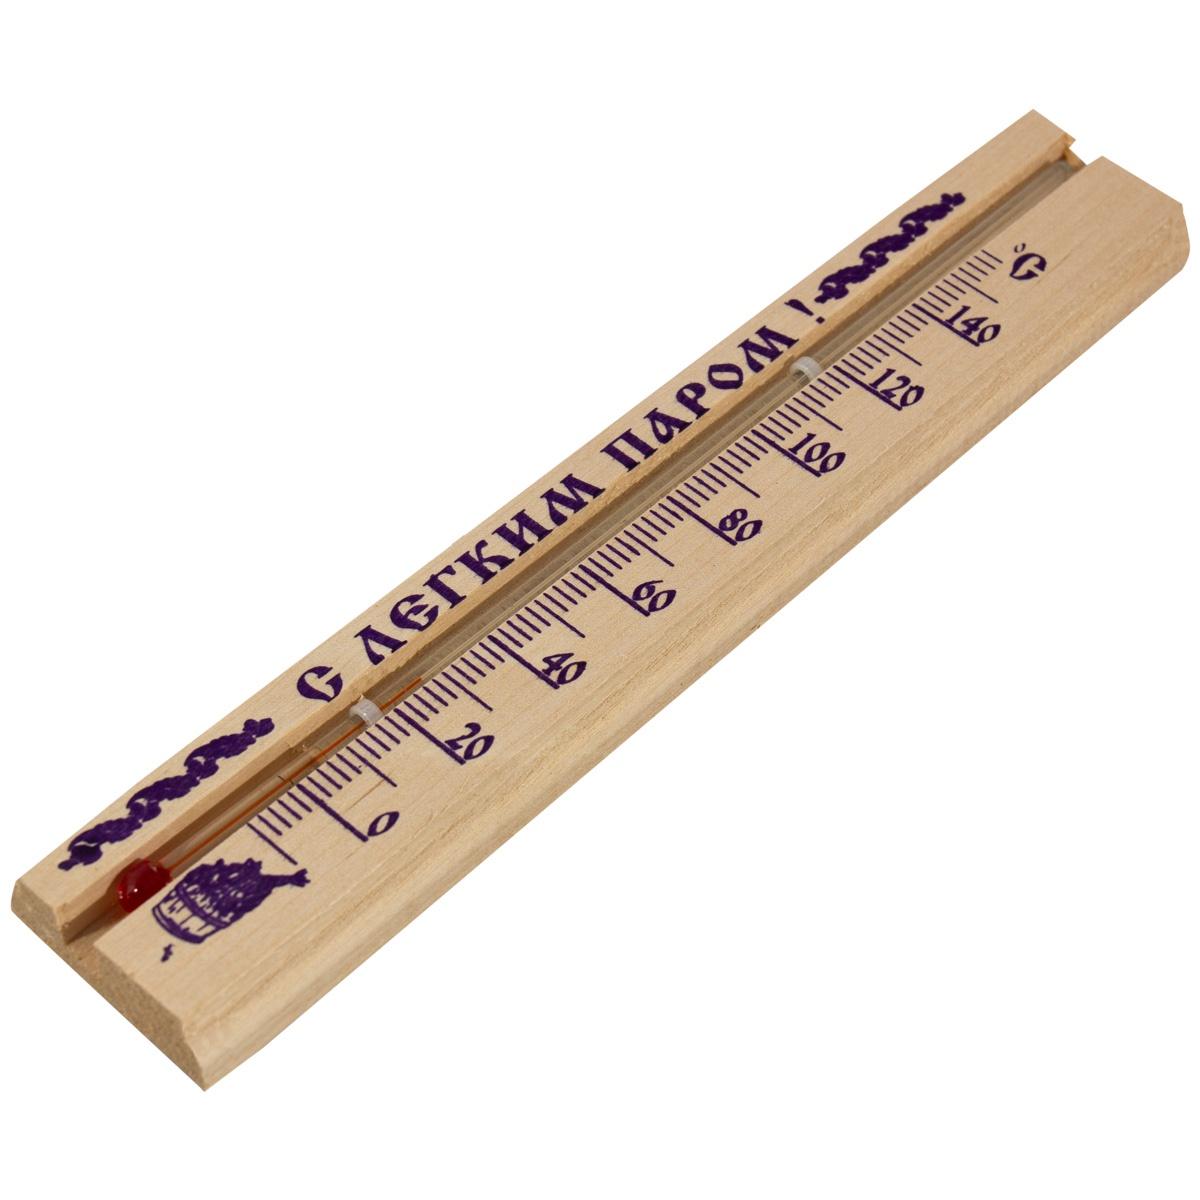 Термометр для бани, сауны 330521 печь для бани и сауны термофор гейзер 2014 inox витра антрацит